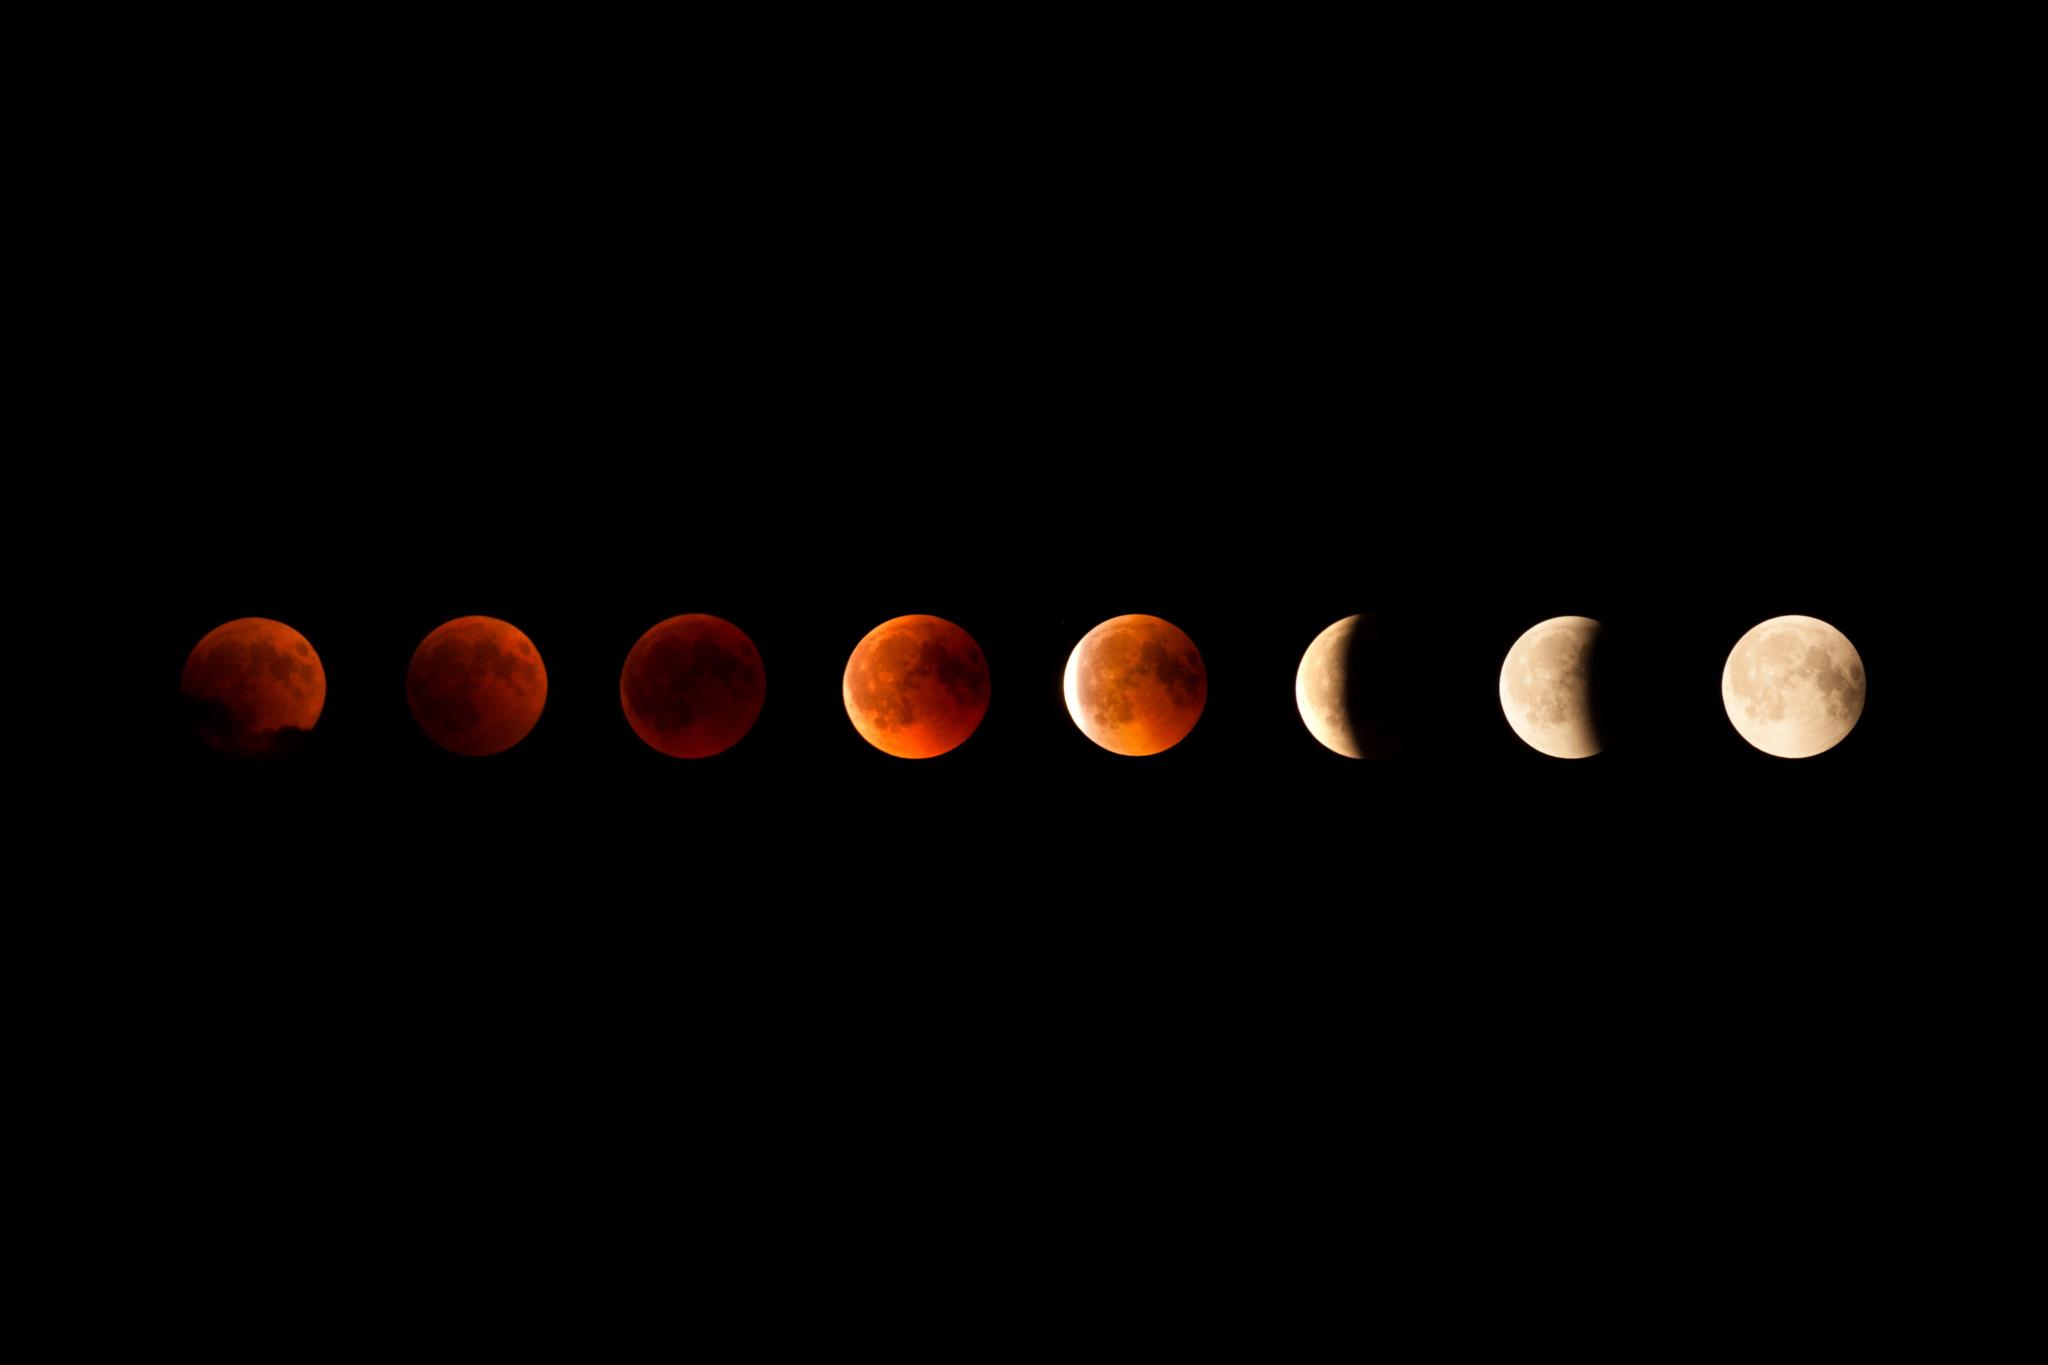 The longest full Moon eclipse